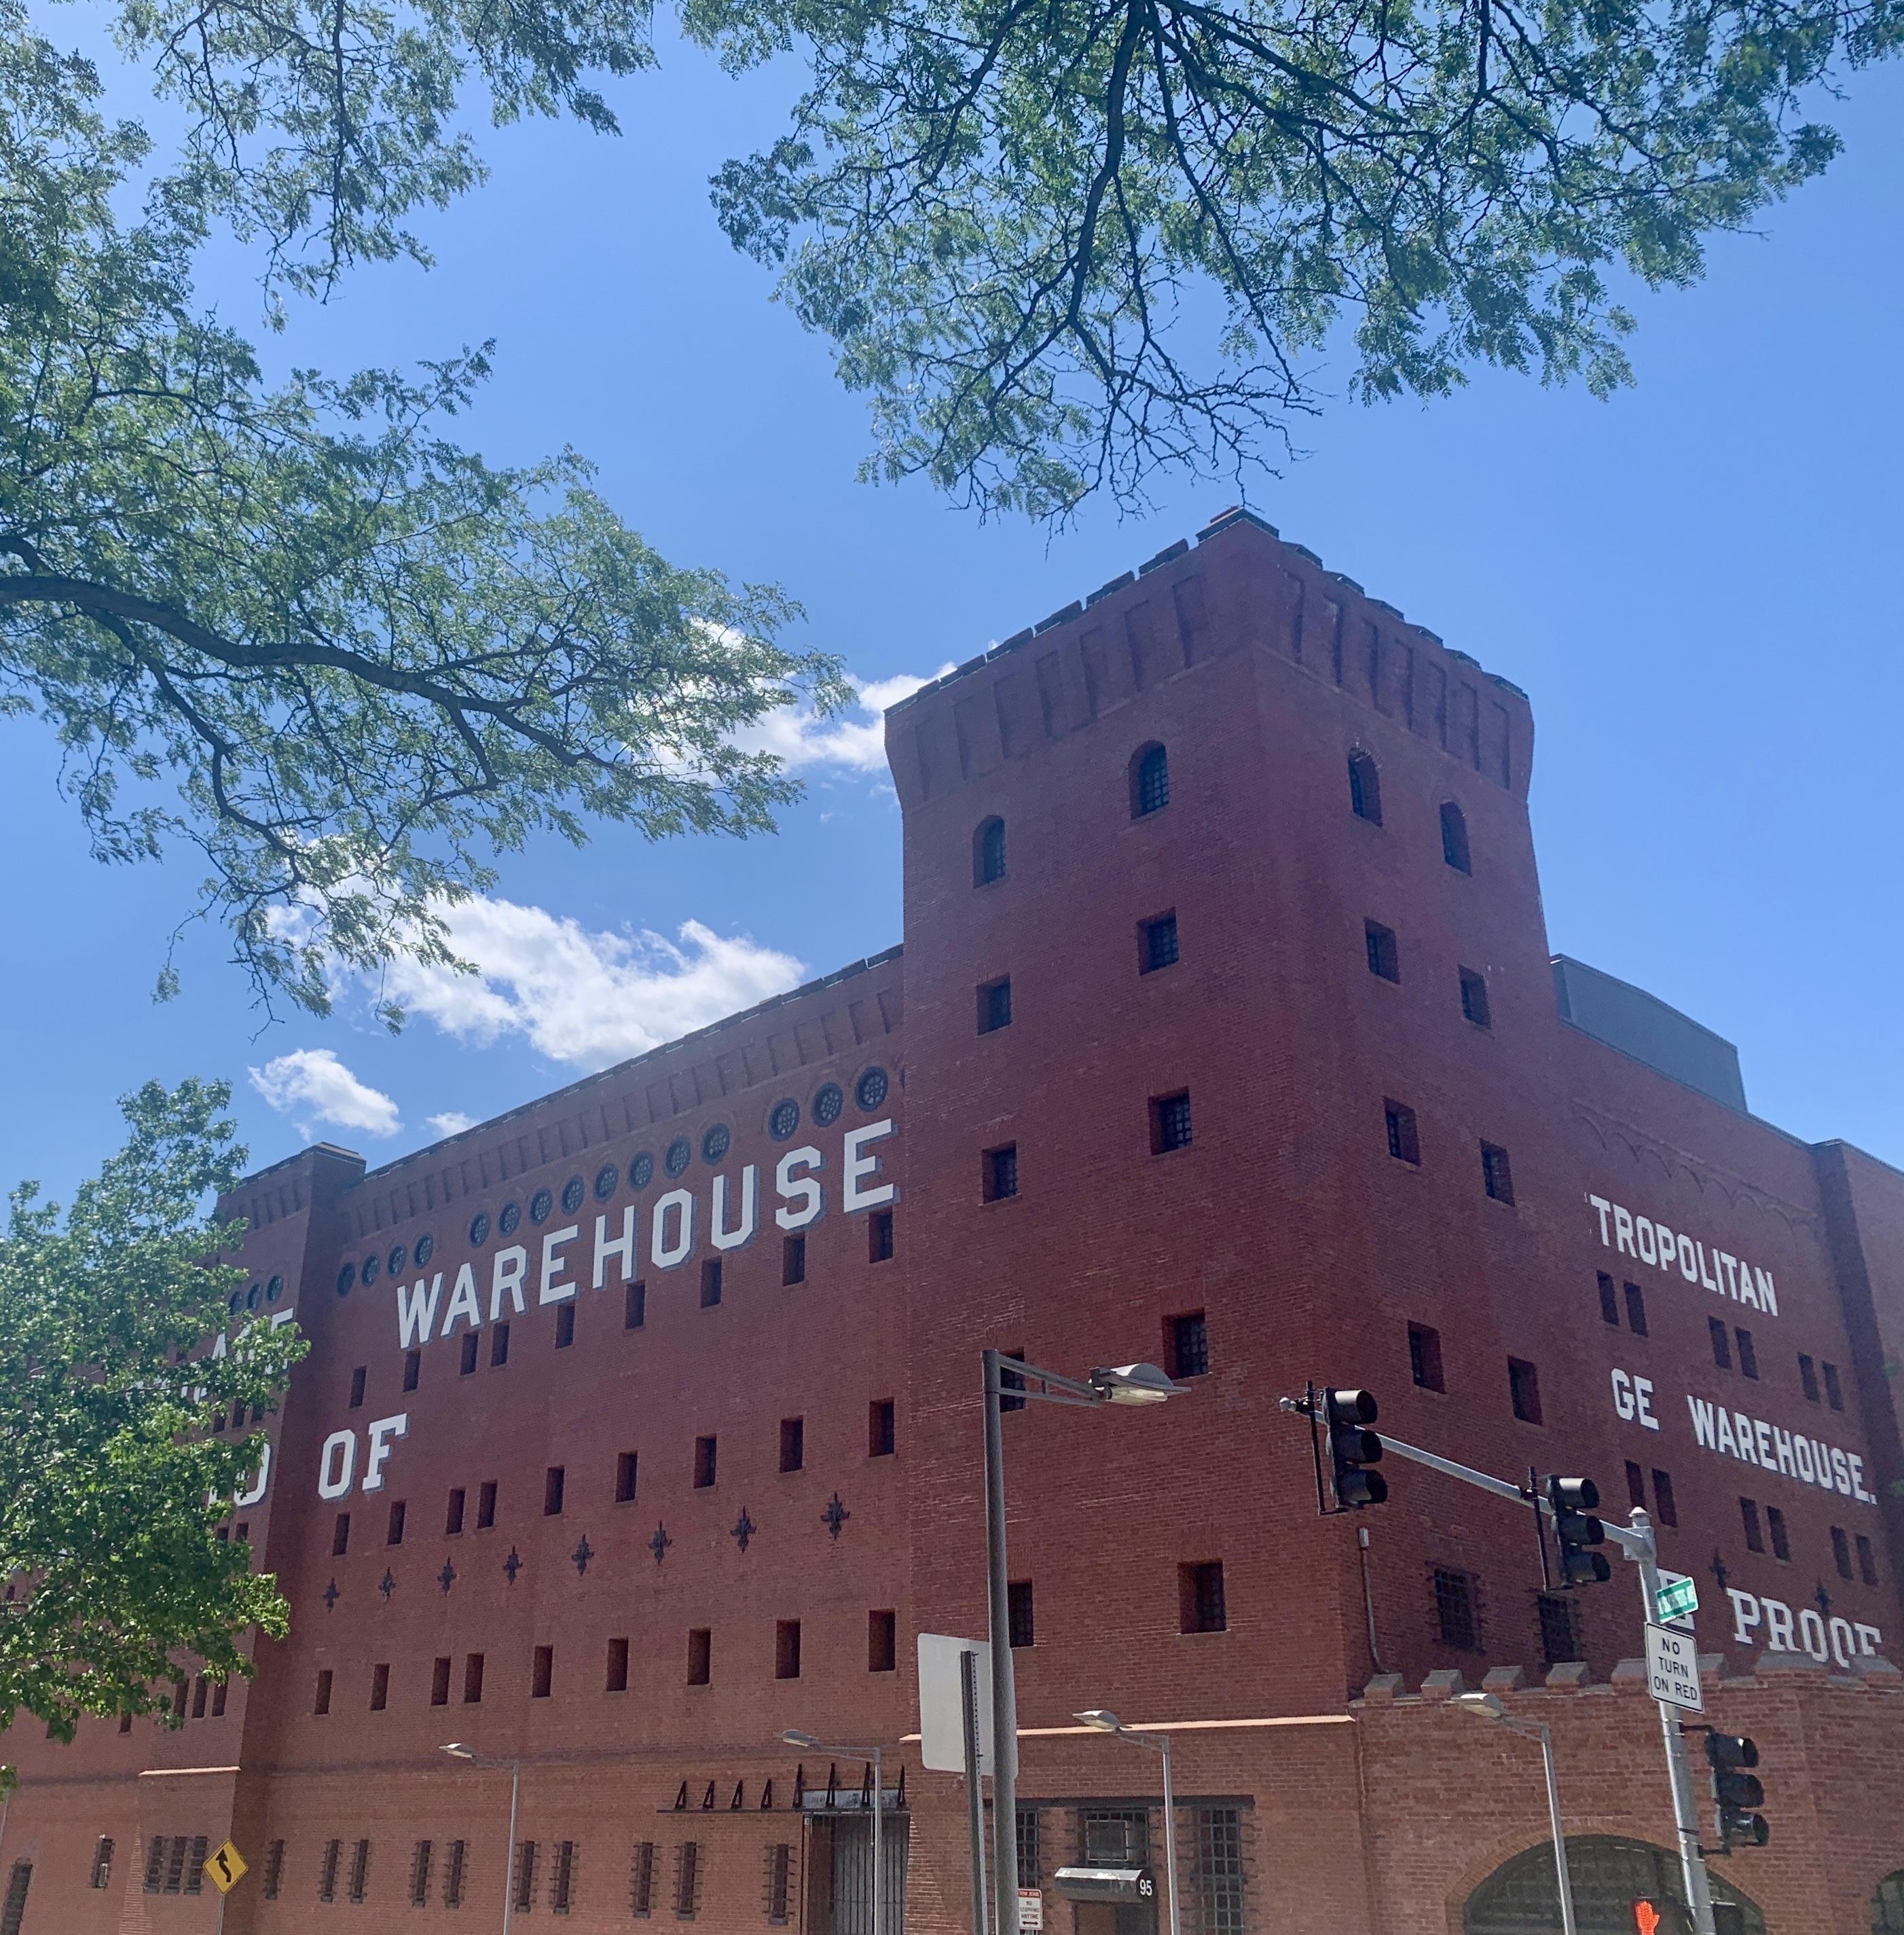 Metropolitan Storage Warehouse on Mass Ave